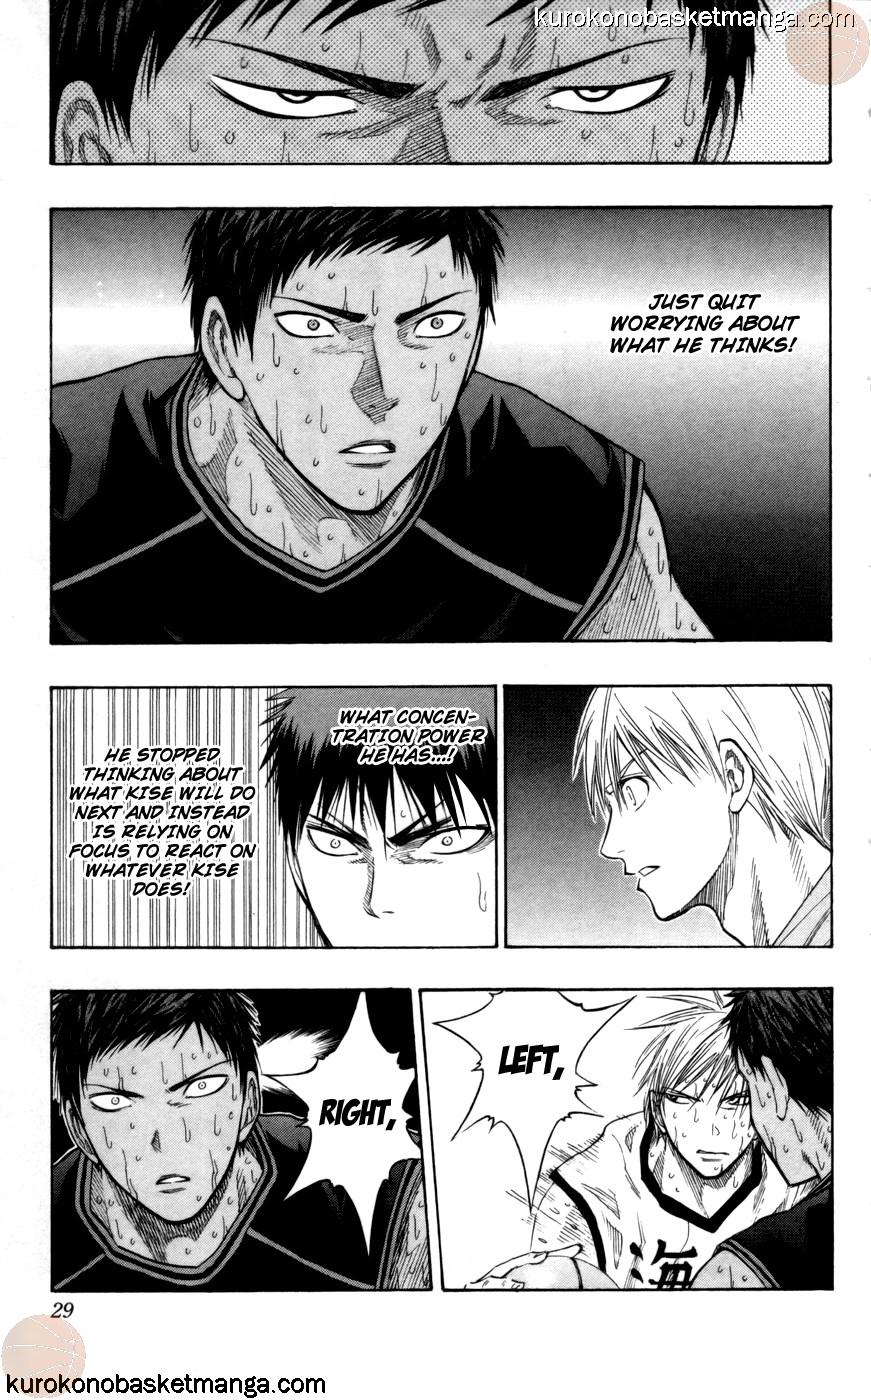 Kuroko no Basket Manga Chapter 72 - Image 03